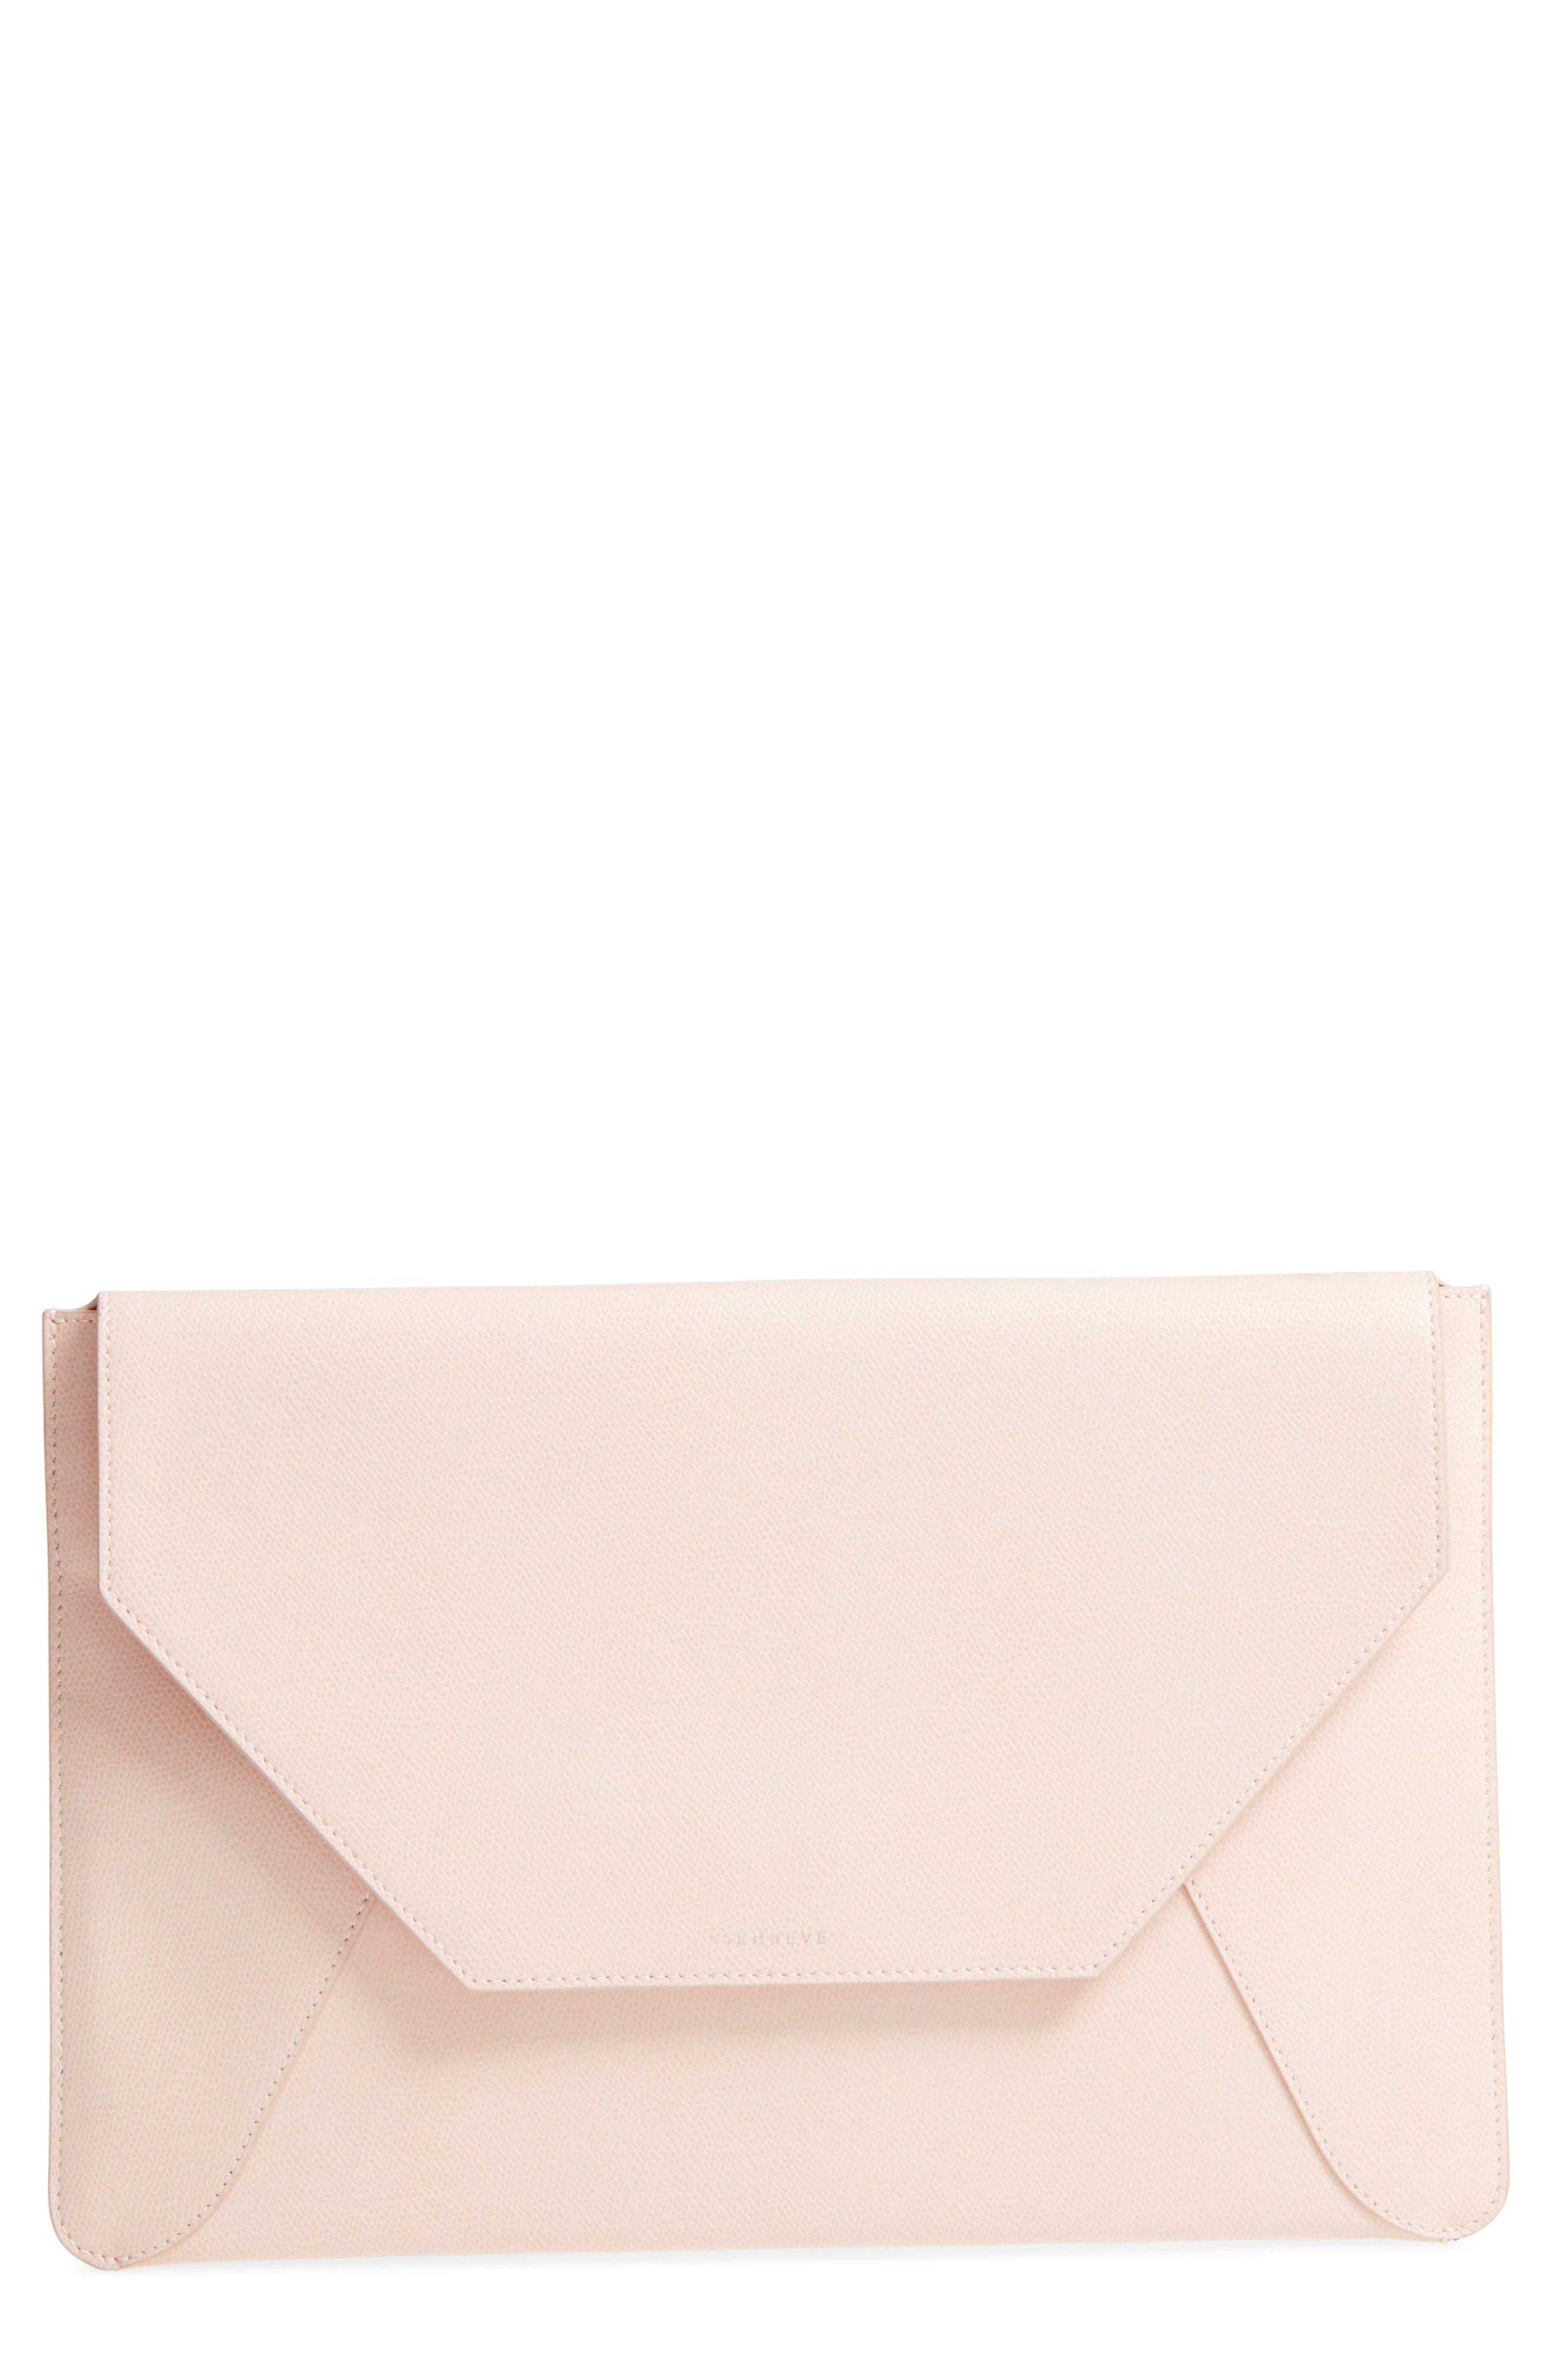 Pebbled Leather Envelope Clutch,                             Main thumbnail 1, color,                             Blush